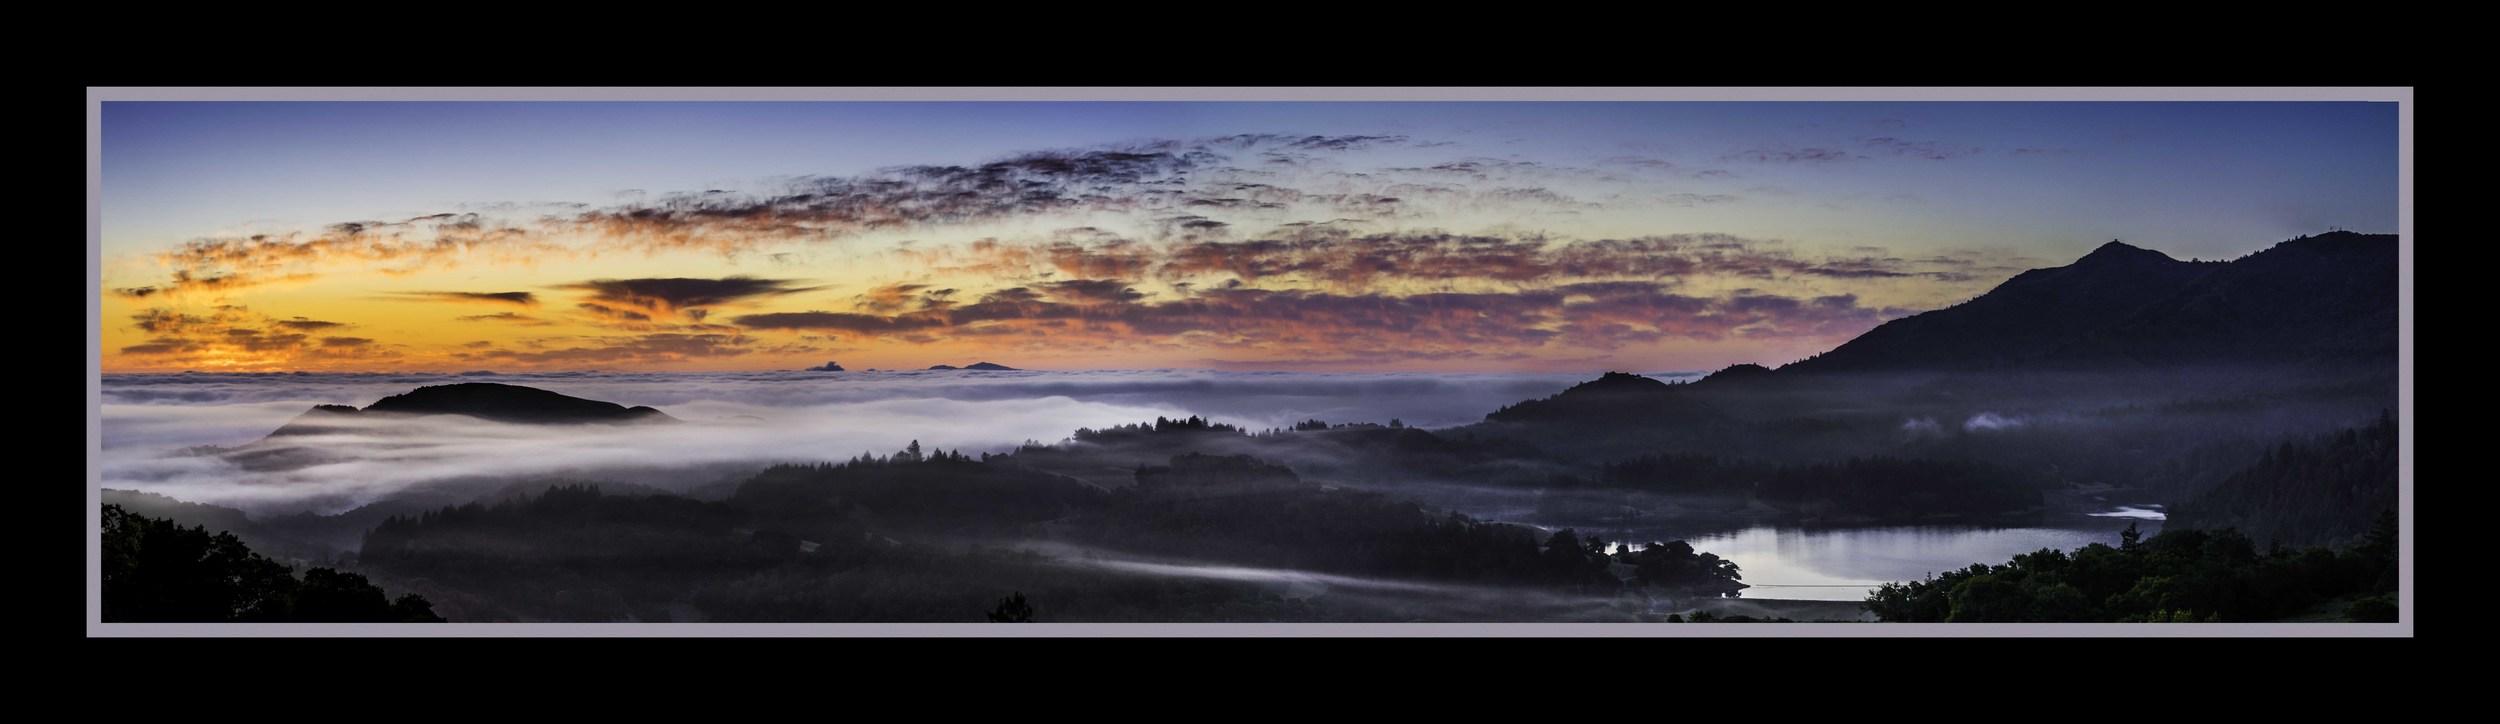 Untitled_Panorama1E4.jpg